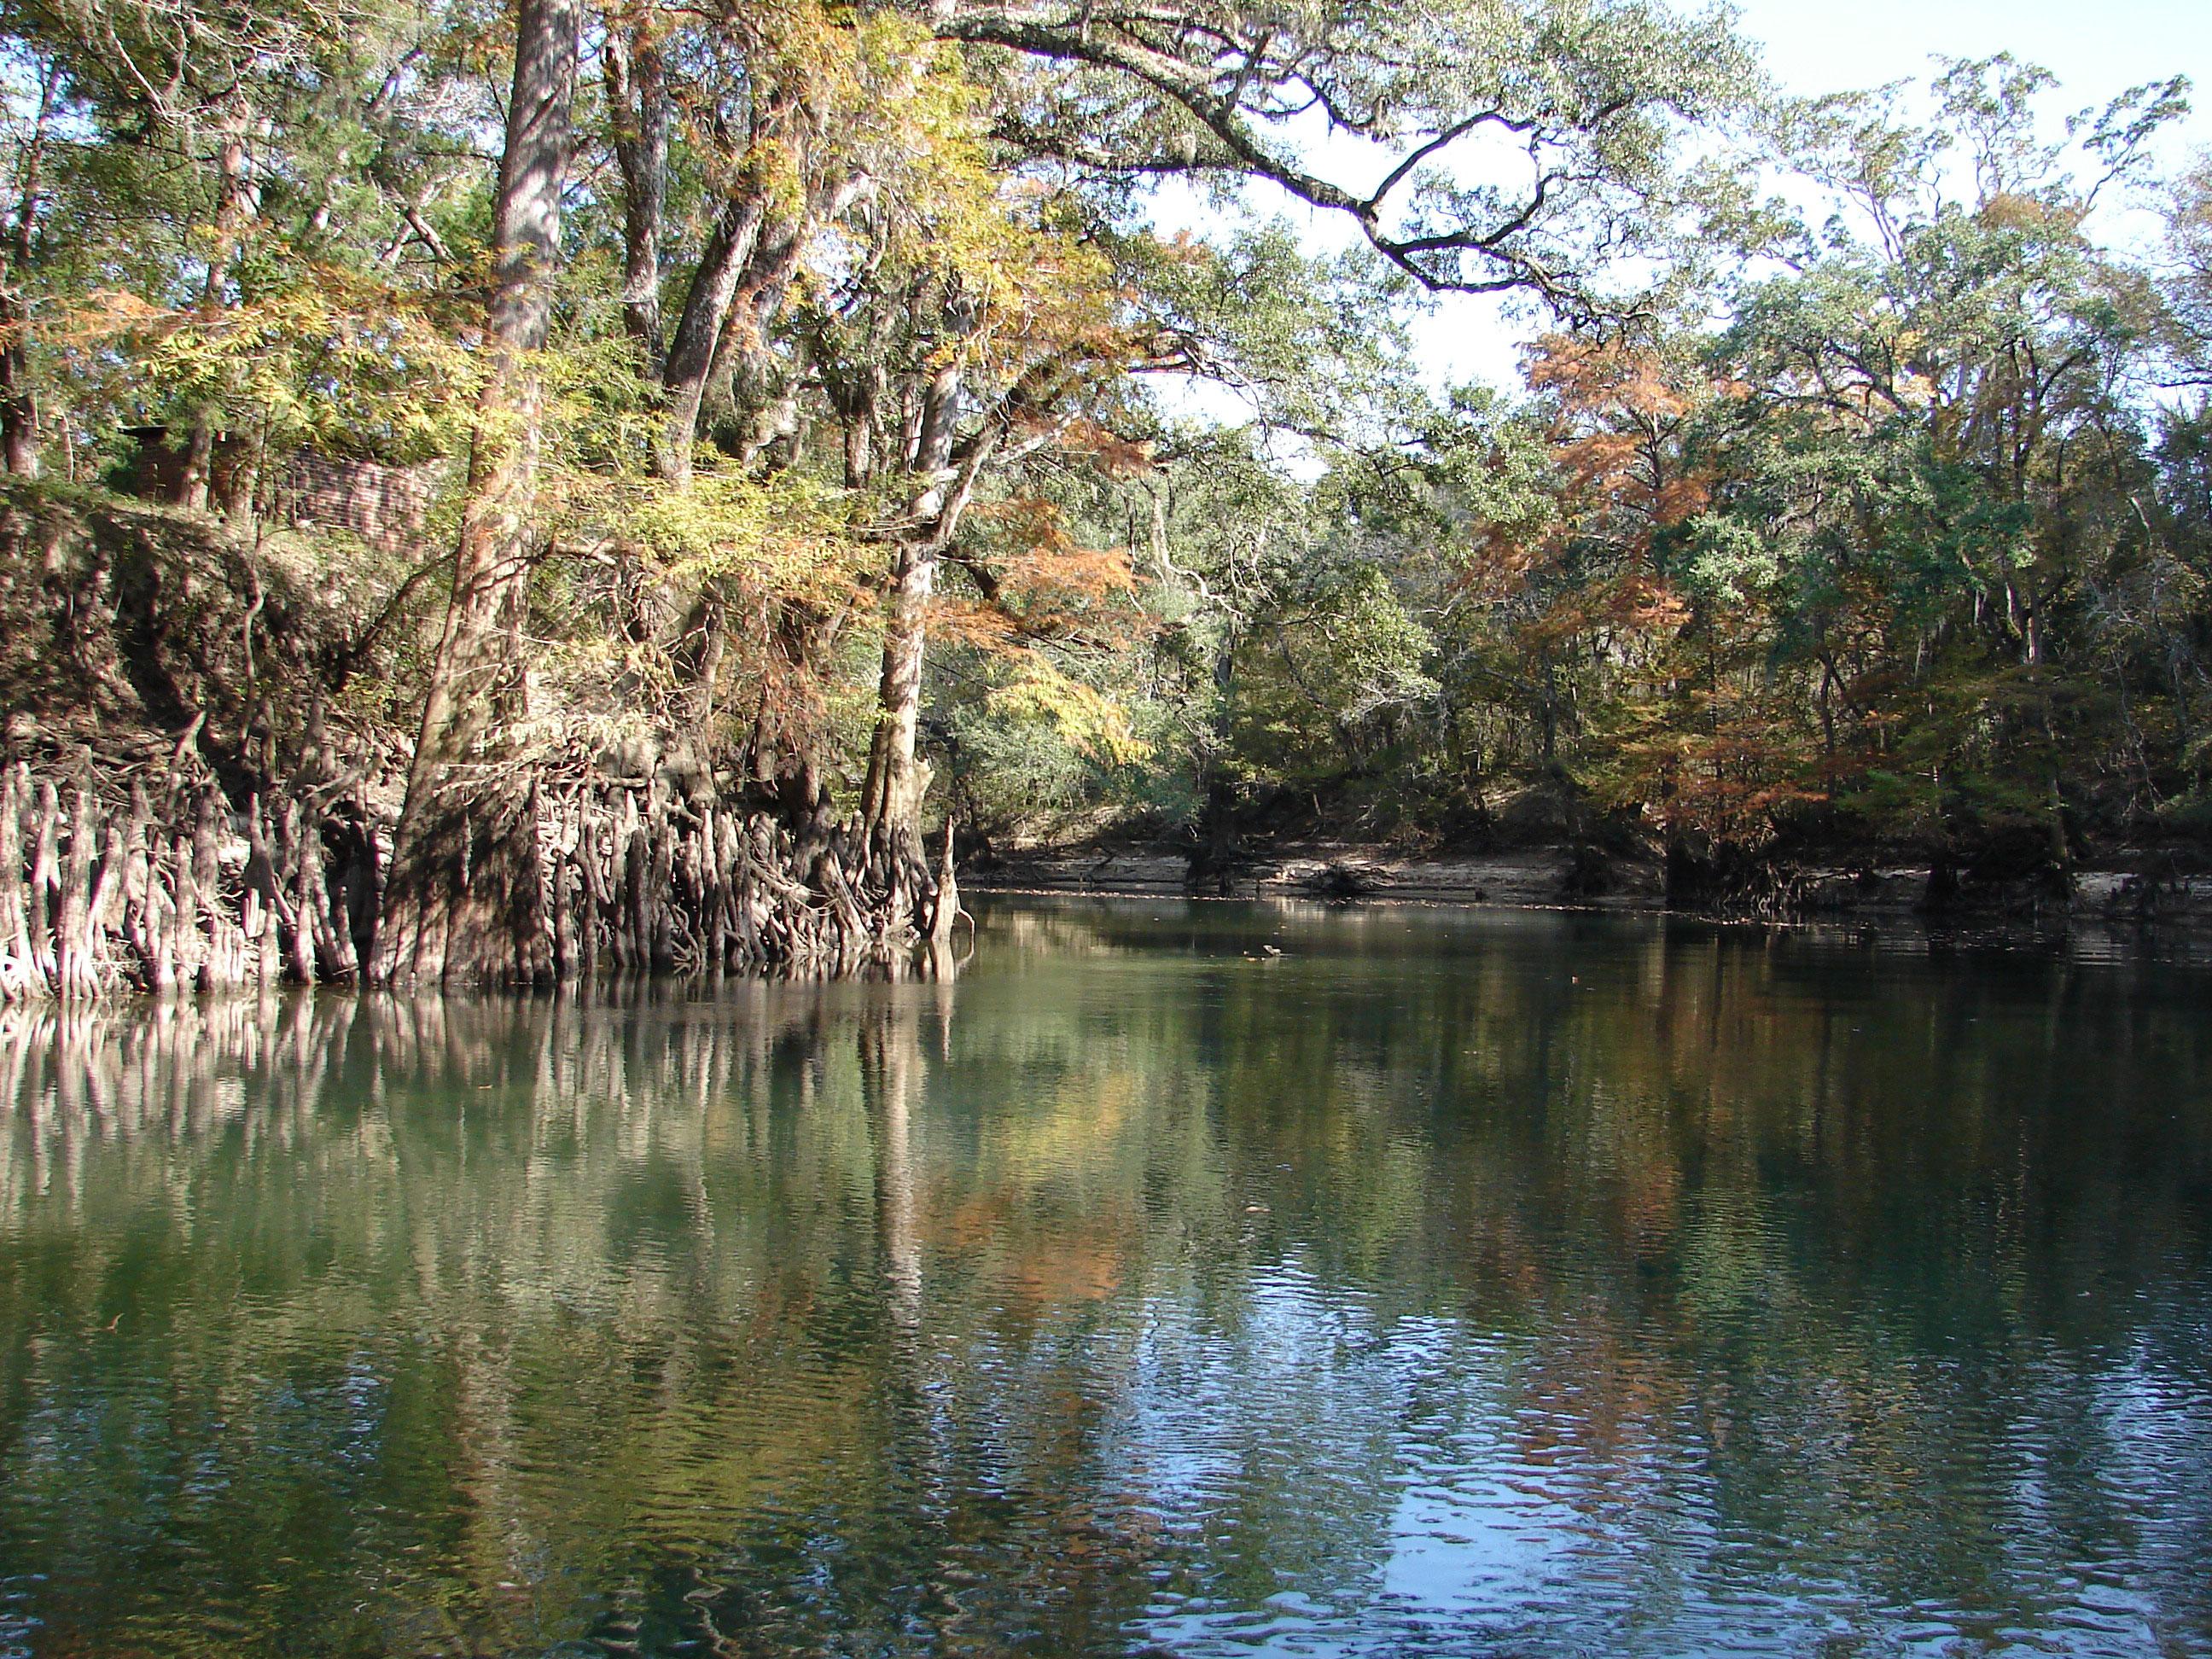 native-americans-lived-along-stock-photos-florida-panhandle-chipola-river-linda-bateman